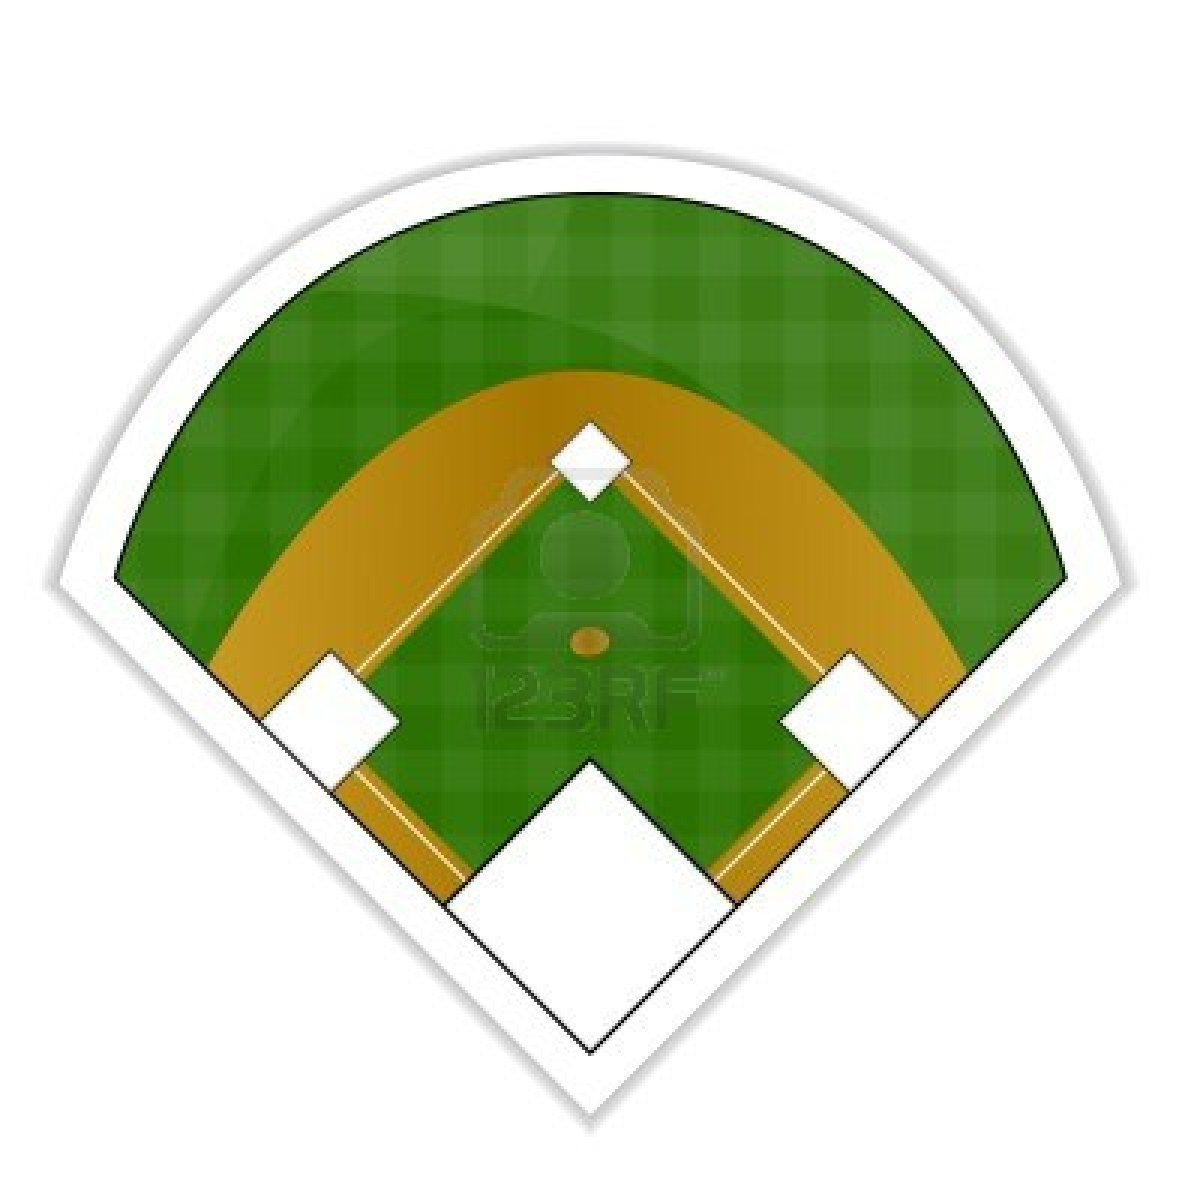 1200x1200 Baseball Diamond Clip Art Biezumd